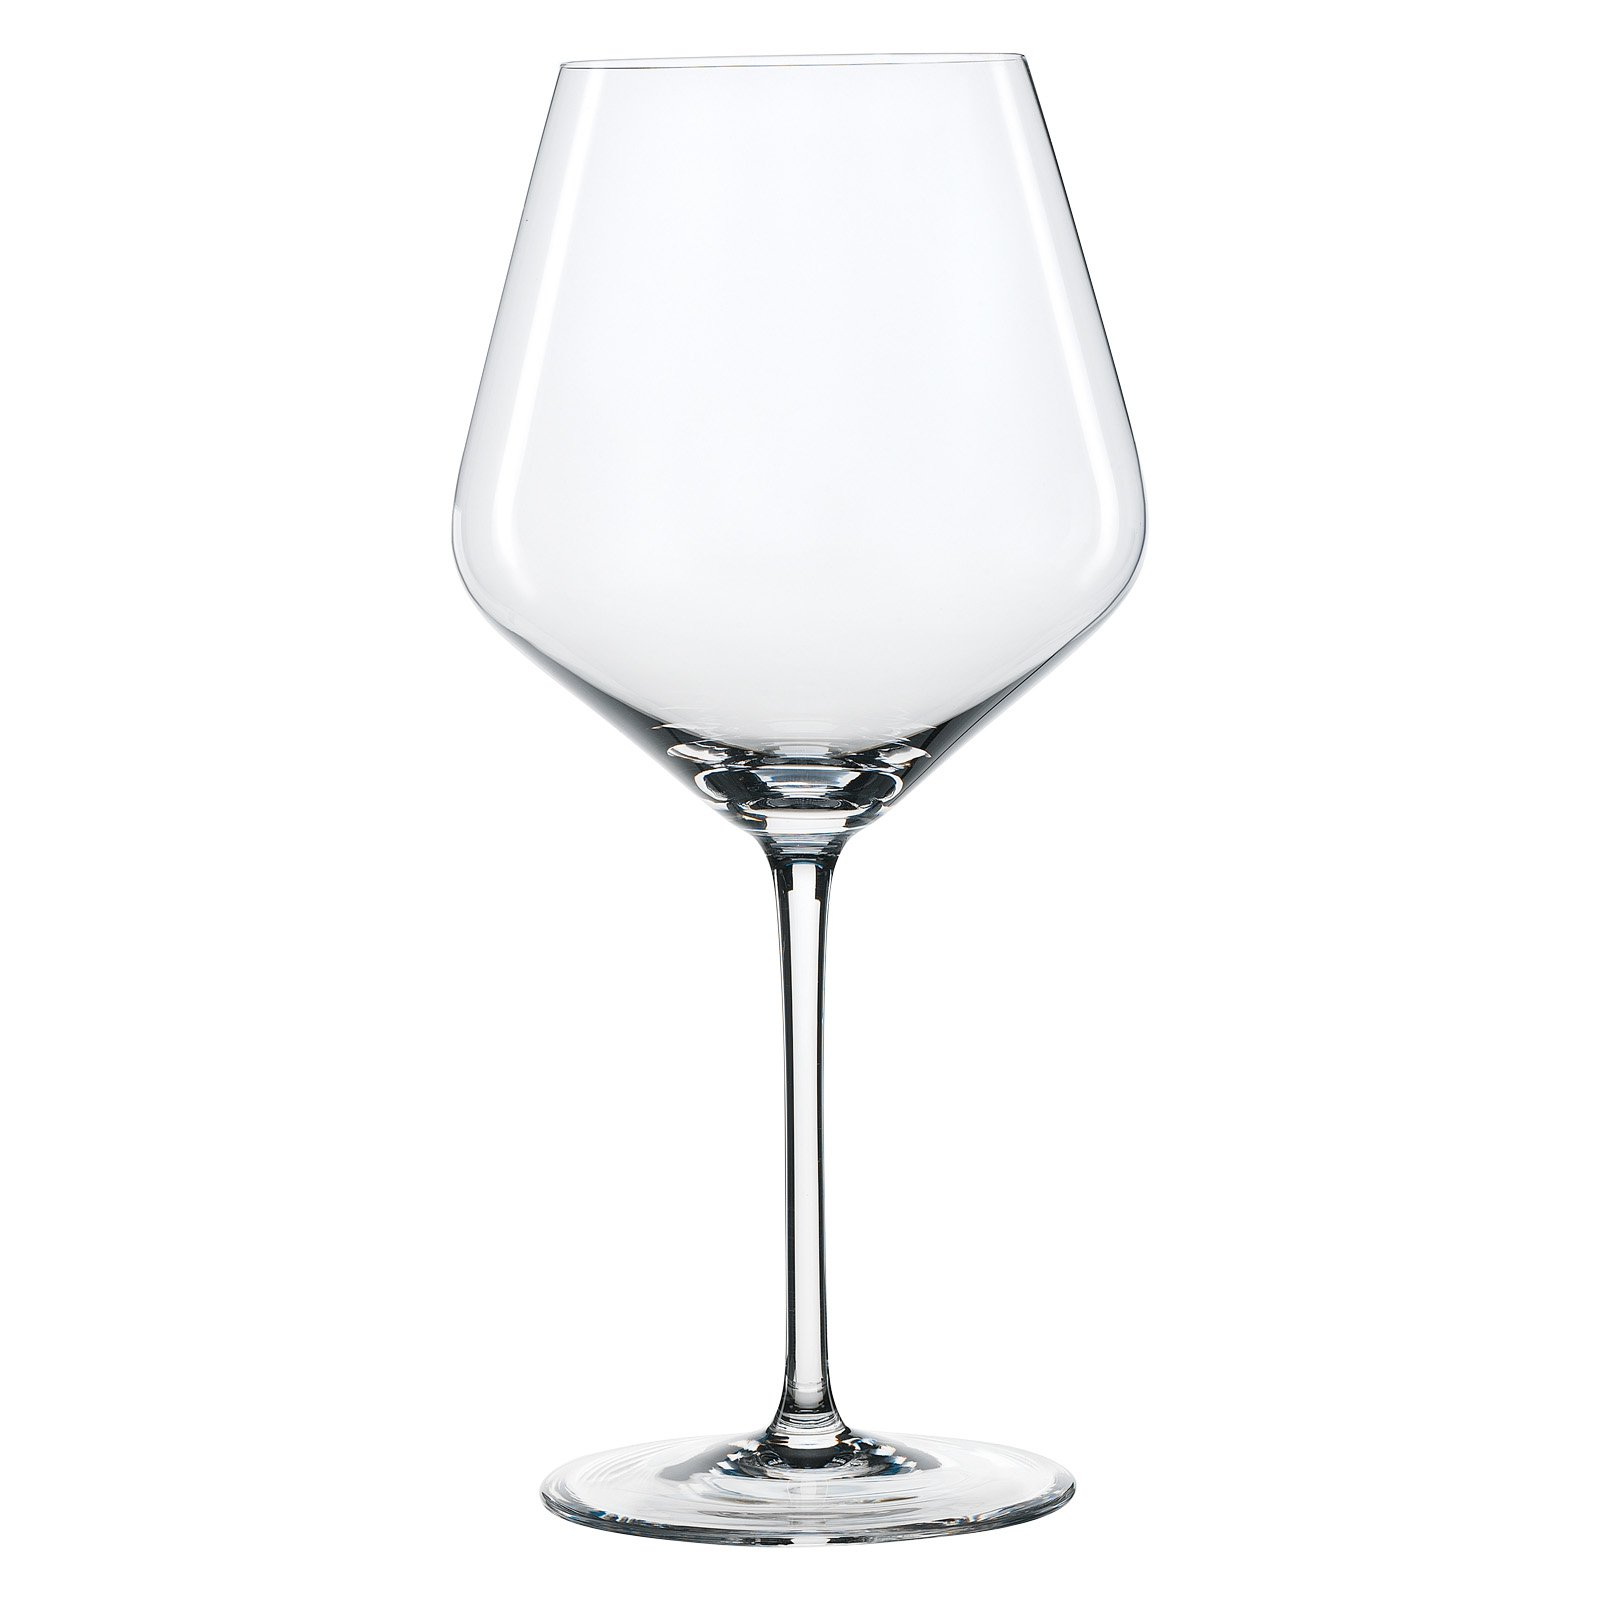 Spiegelau Style Burgundy Glass Set of 4 by